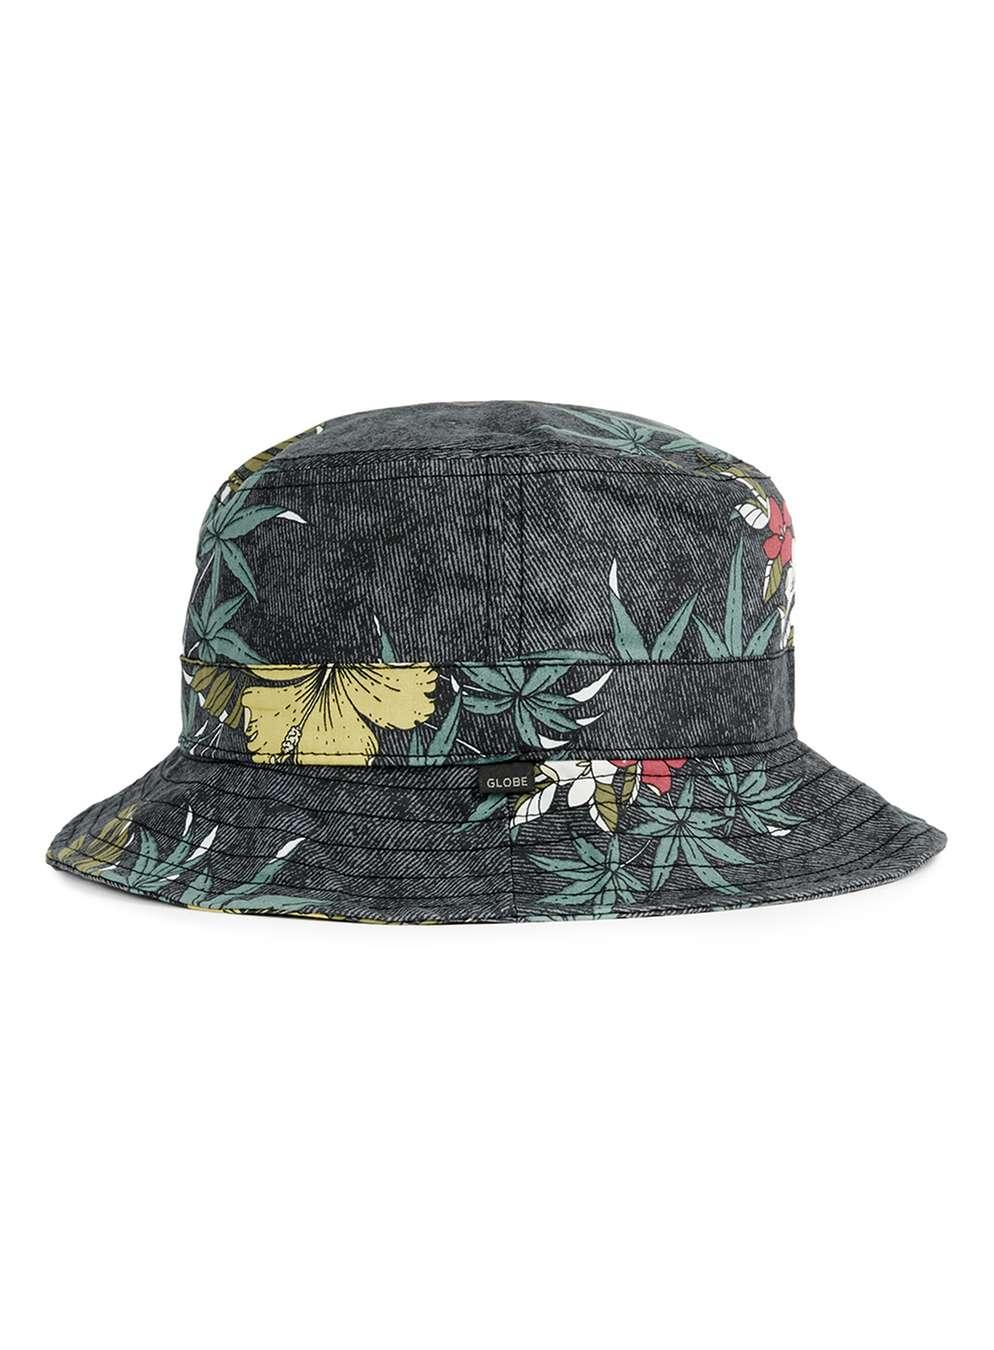 TOPMAN bucket hat.jpg